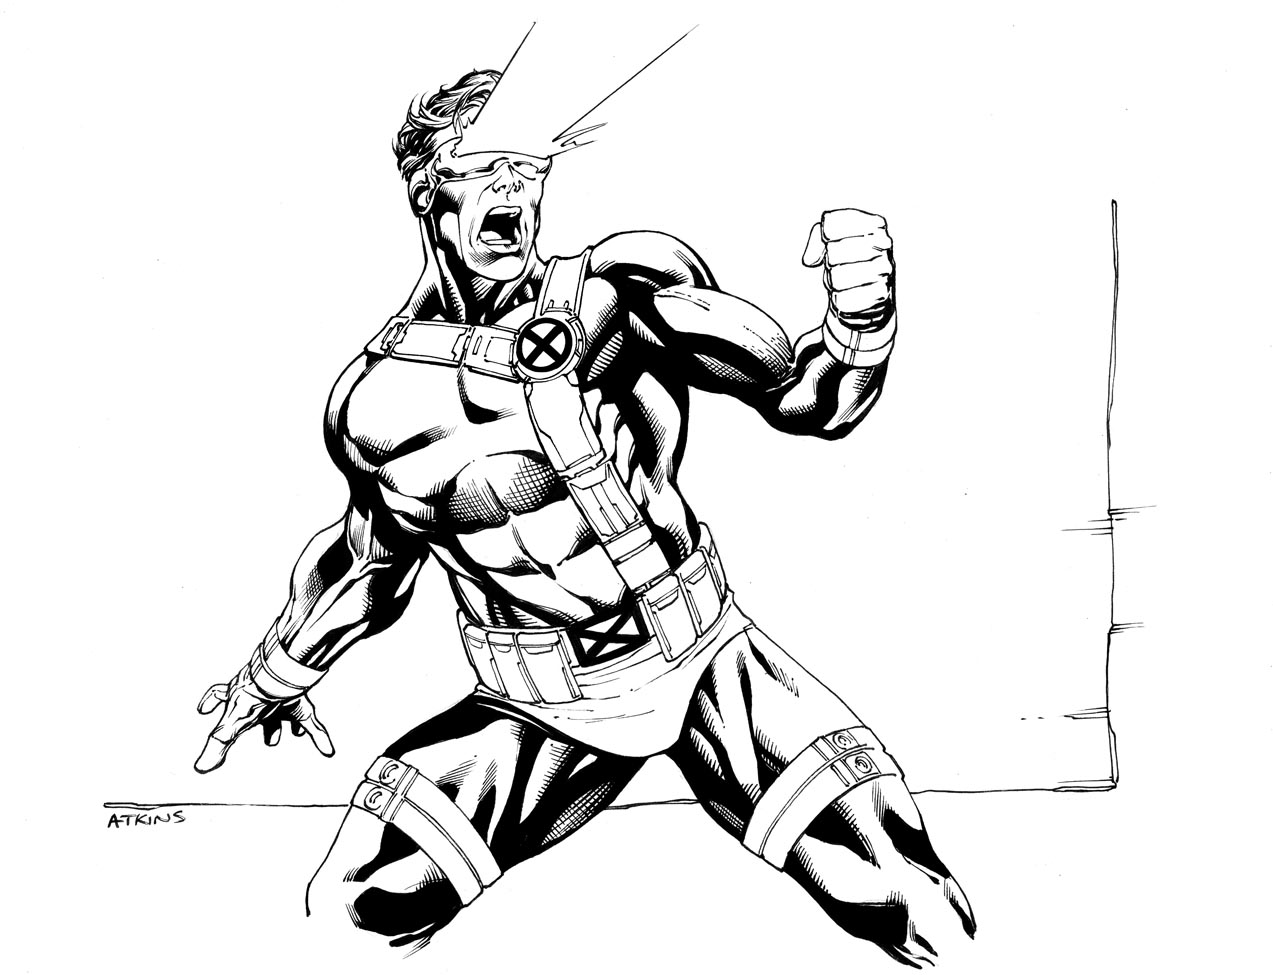 Free coloring pages x-men - Cyclops Coloring Pages X Men